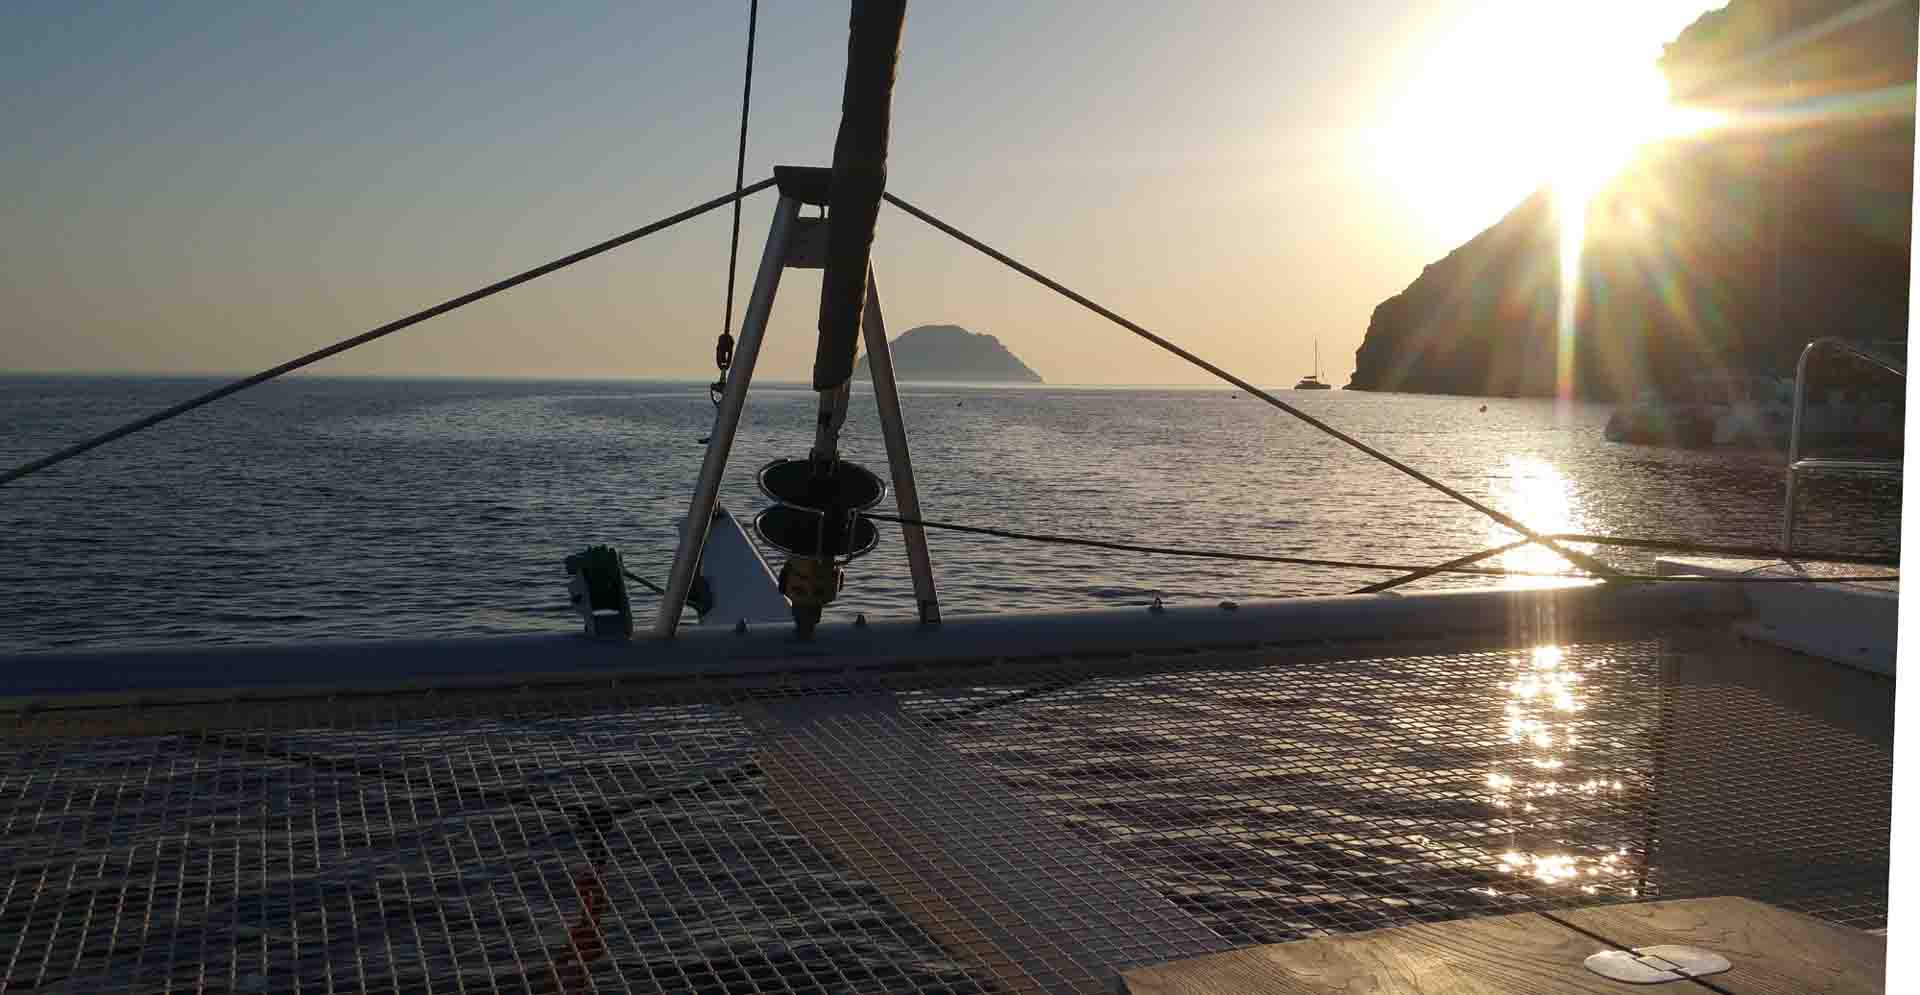 cucire vela Filicudi Porto Pignataro Pecorini rada navigando per le Eolie Fontaine Pajot Saba 50 catamarano barca a vela